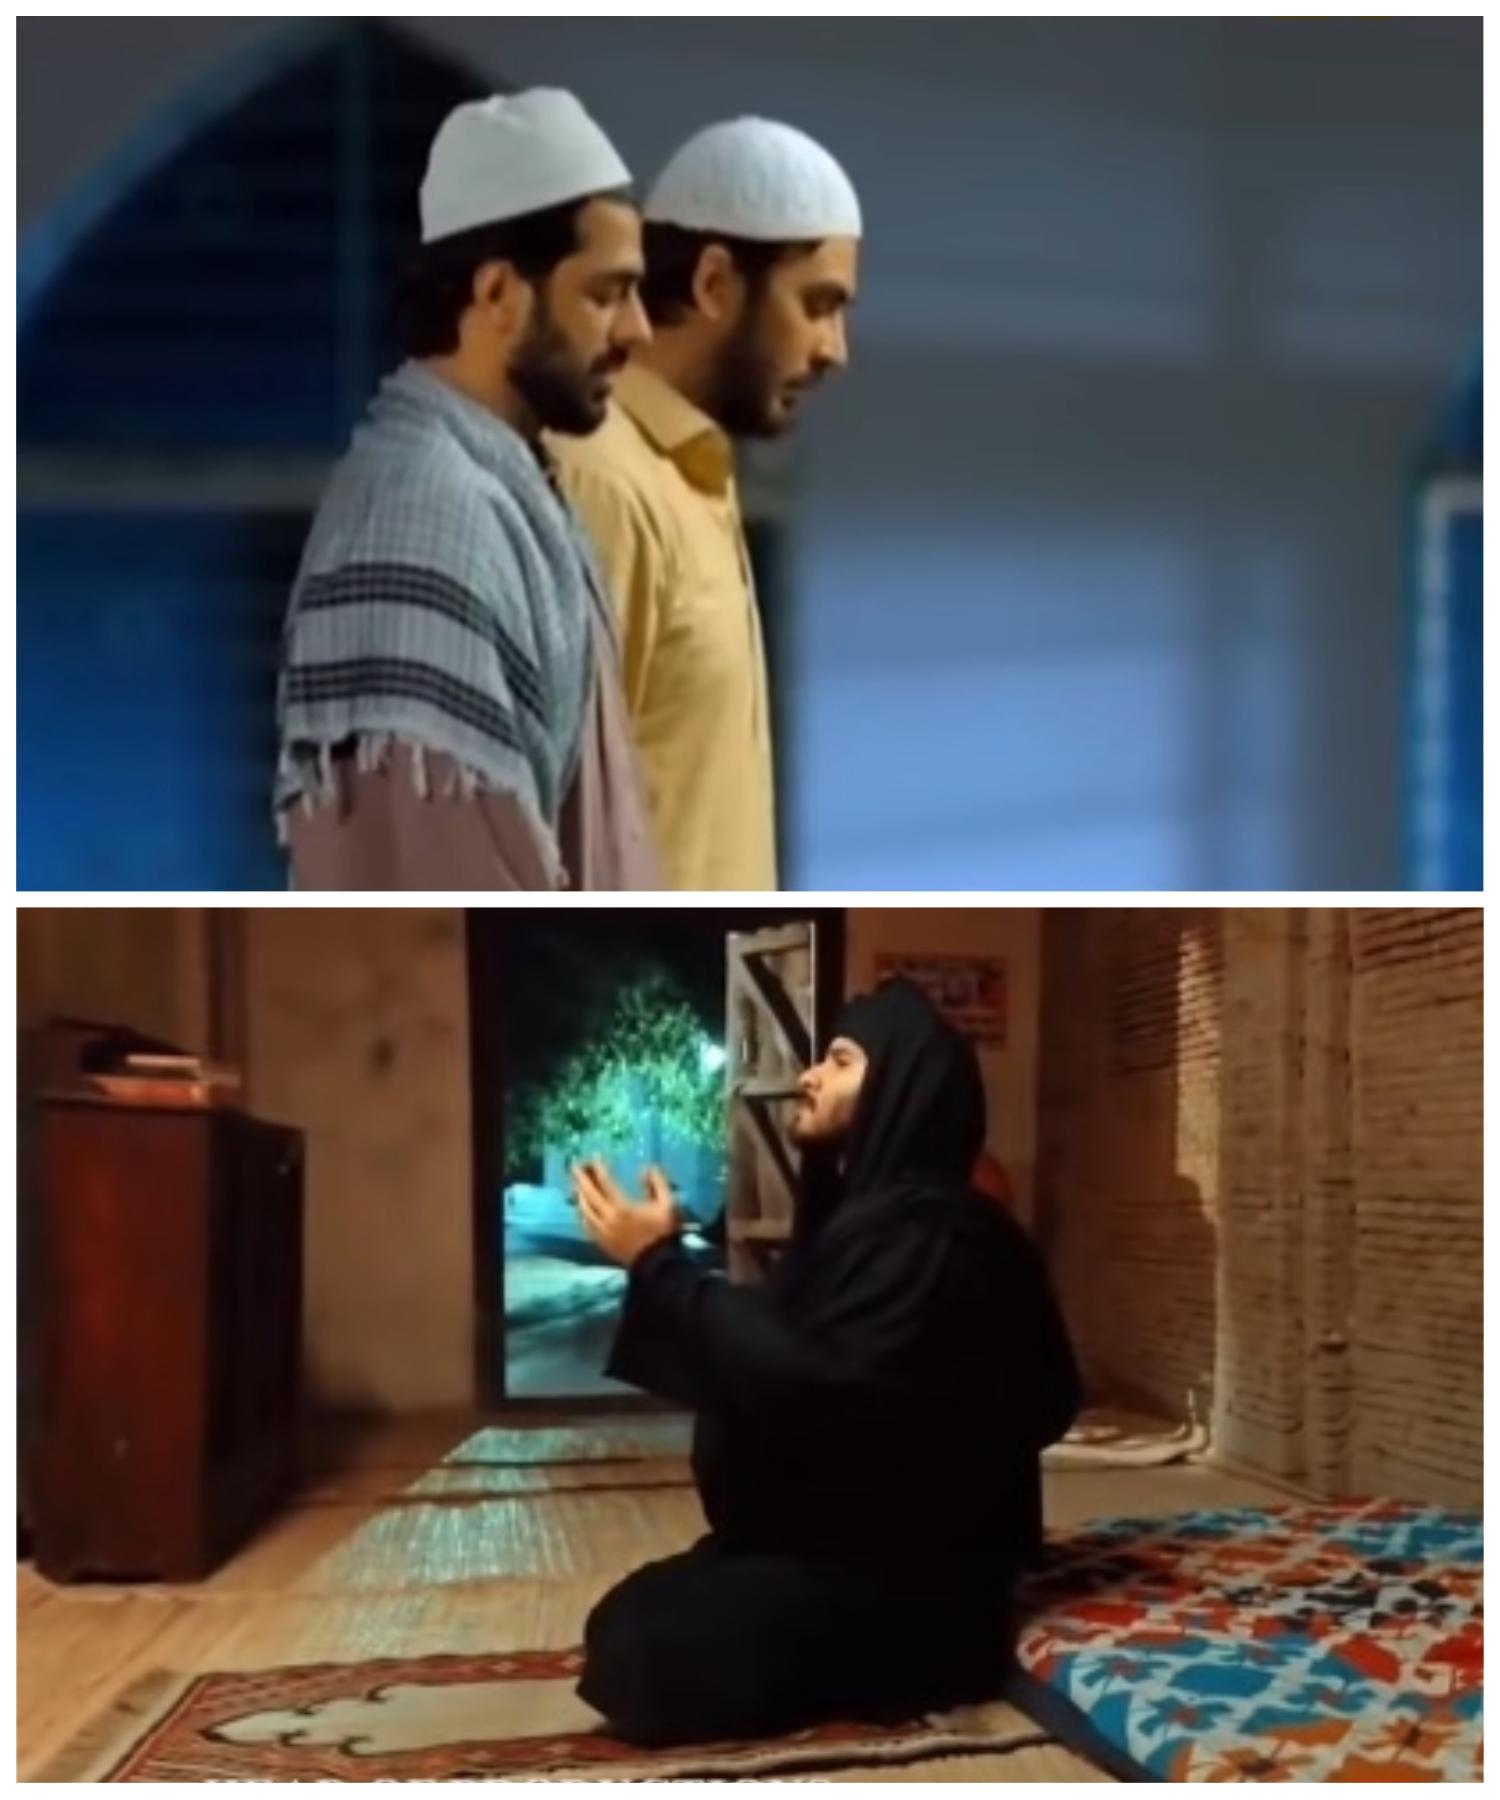 Similarities & Differences Between The Seasons of Khuda Aur Mohabbat